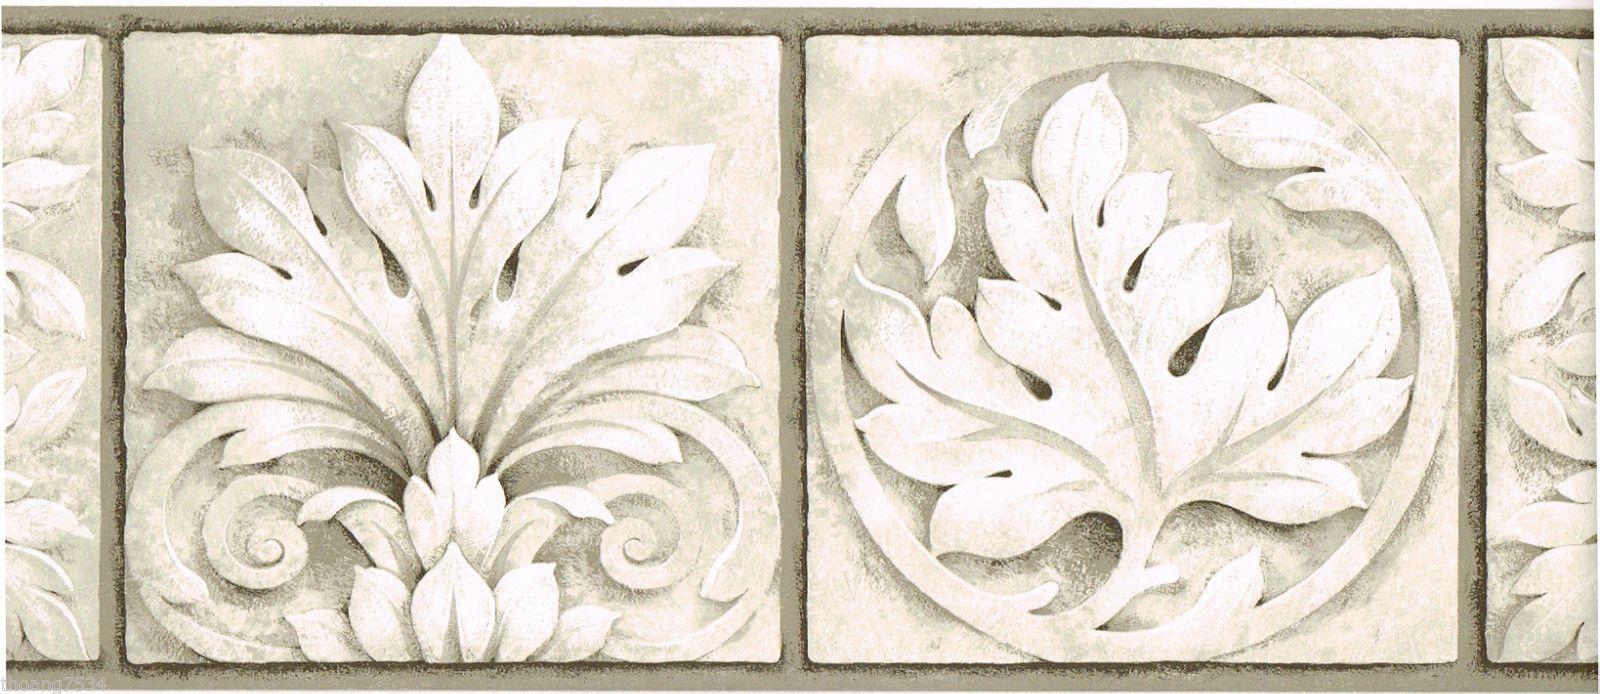 Architectural Grey Taupe Cream Beige Leaf Rosette Frame